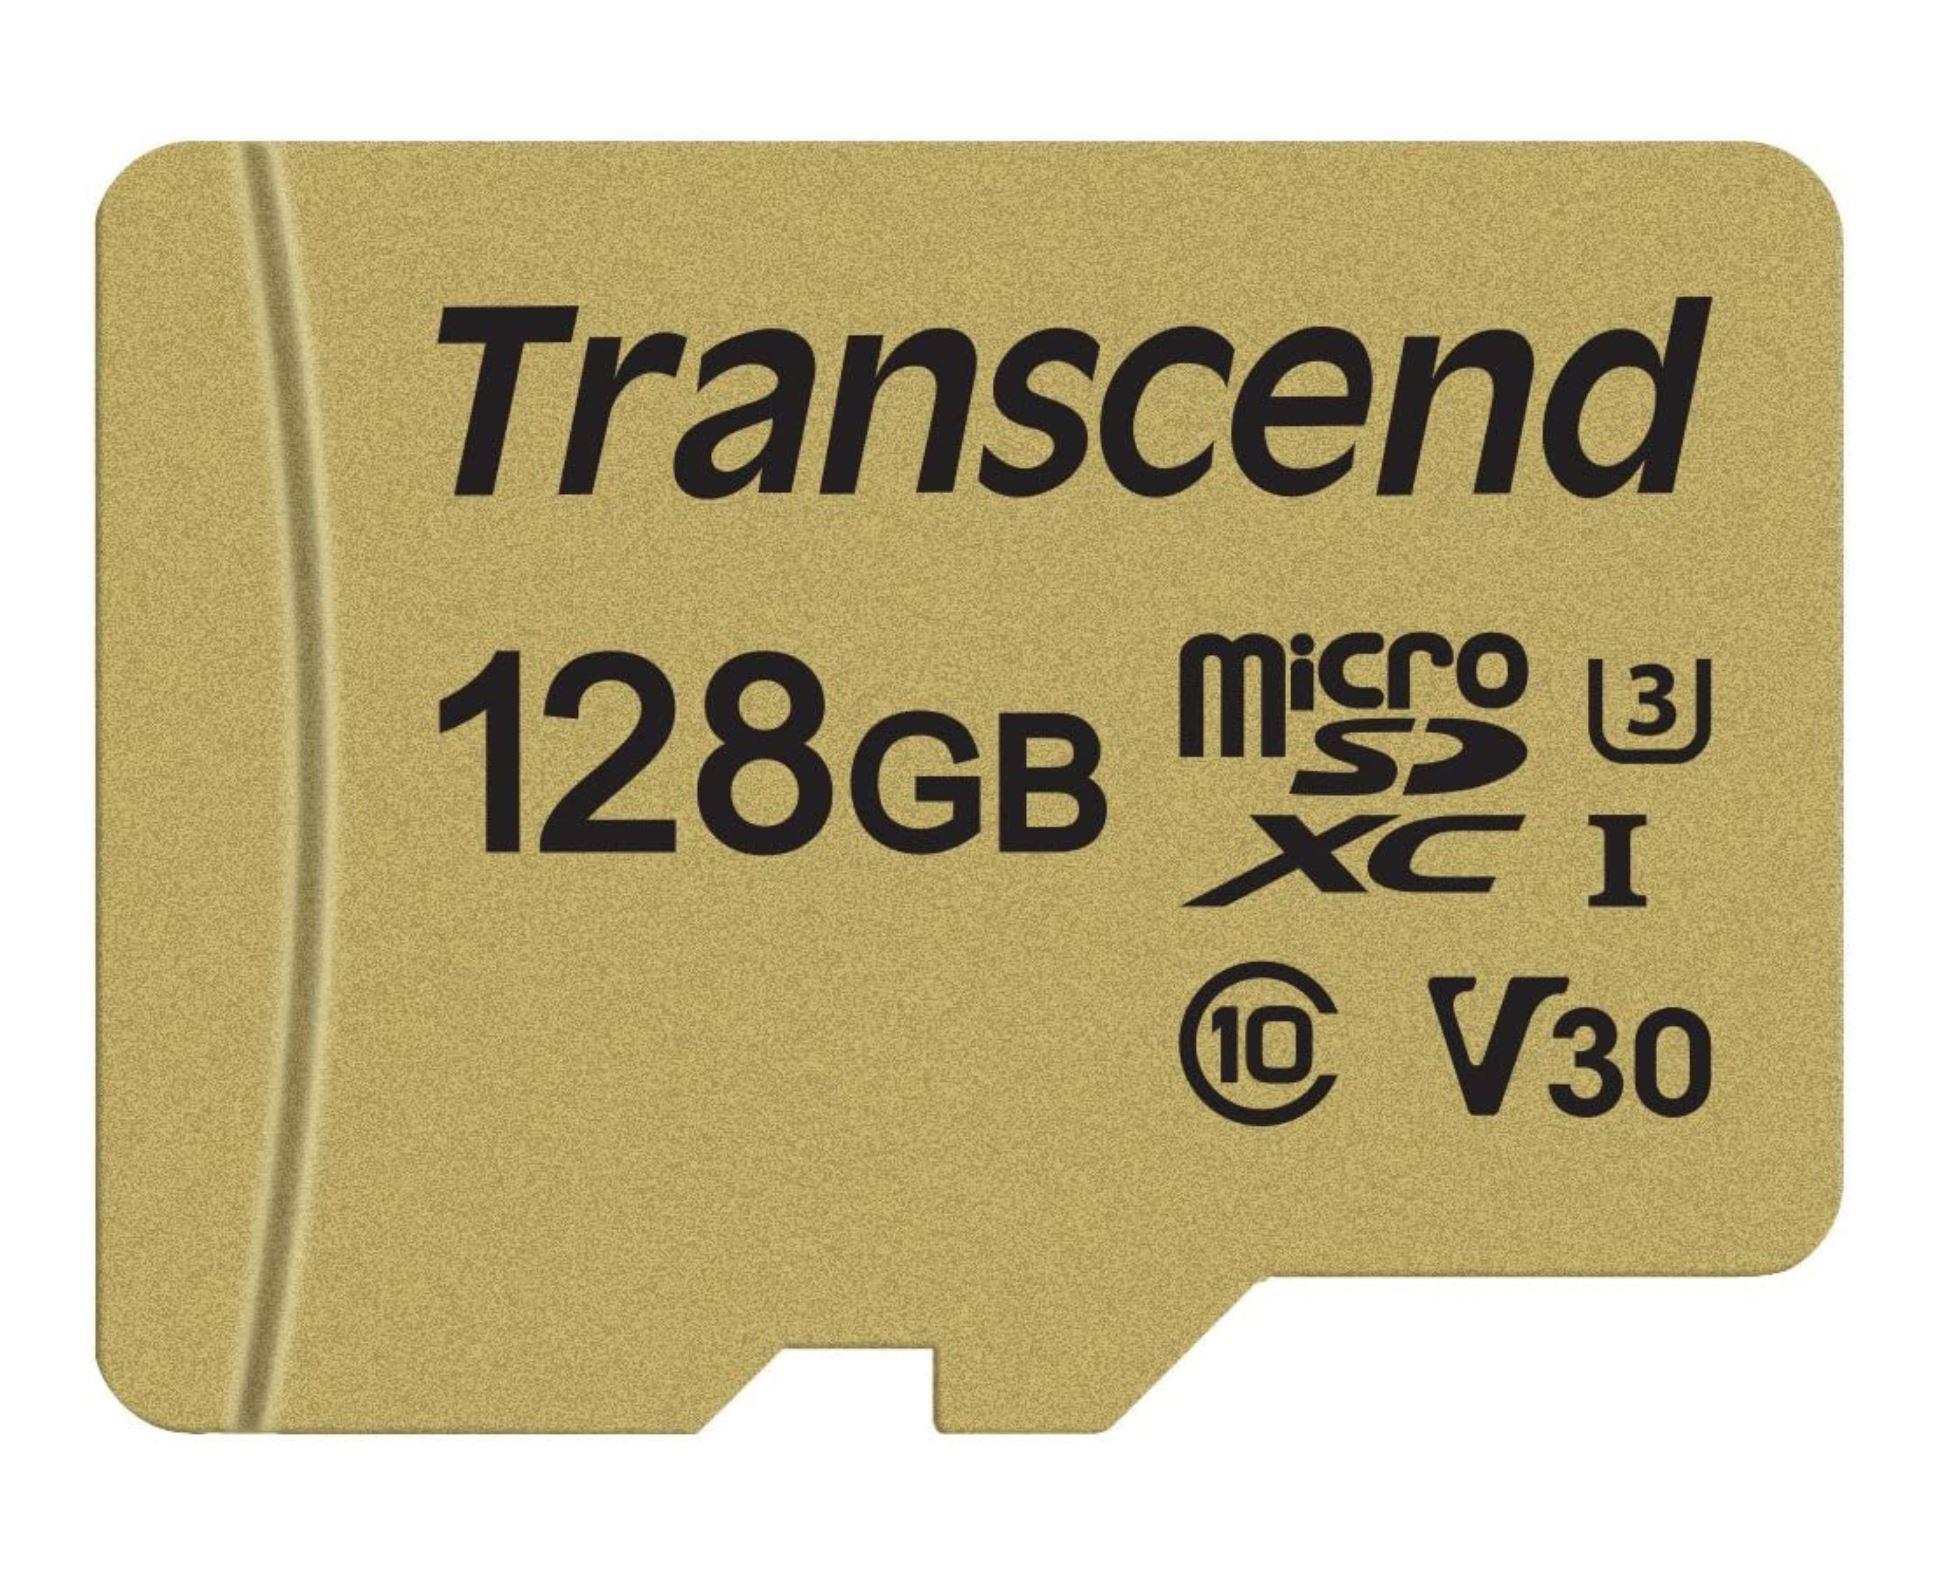 Transcend Micro SDXC | 128GB | C10 | Flash Geheugen